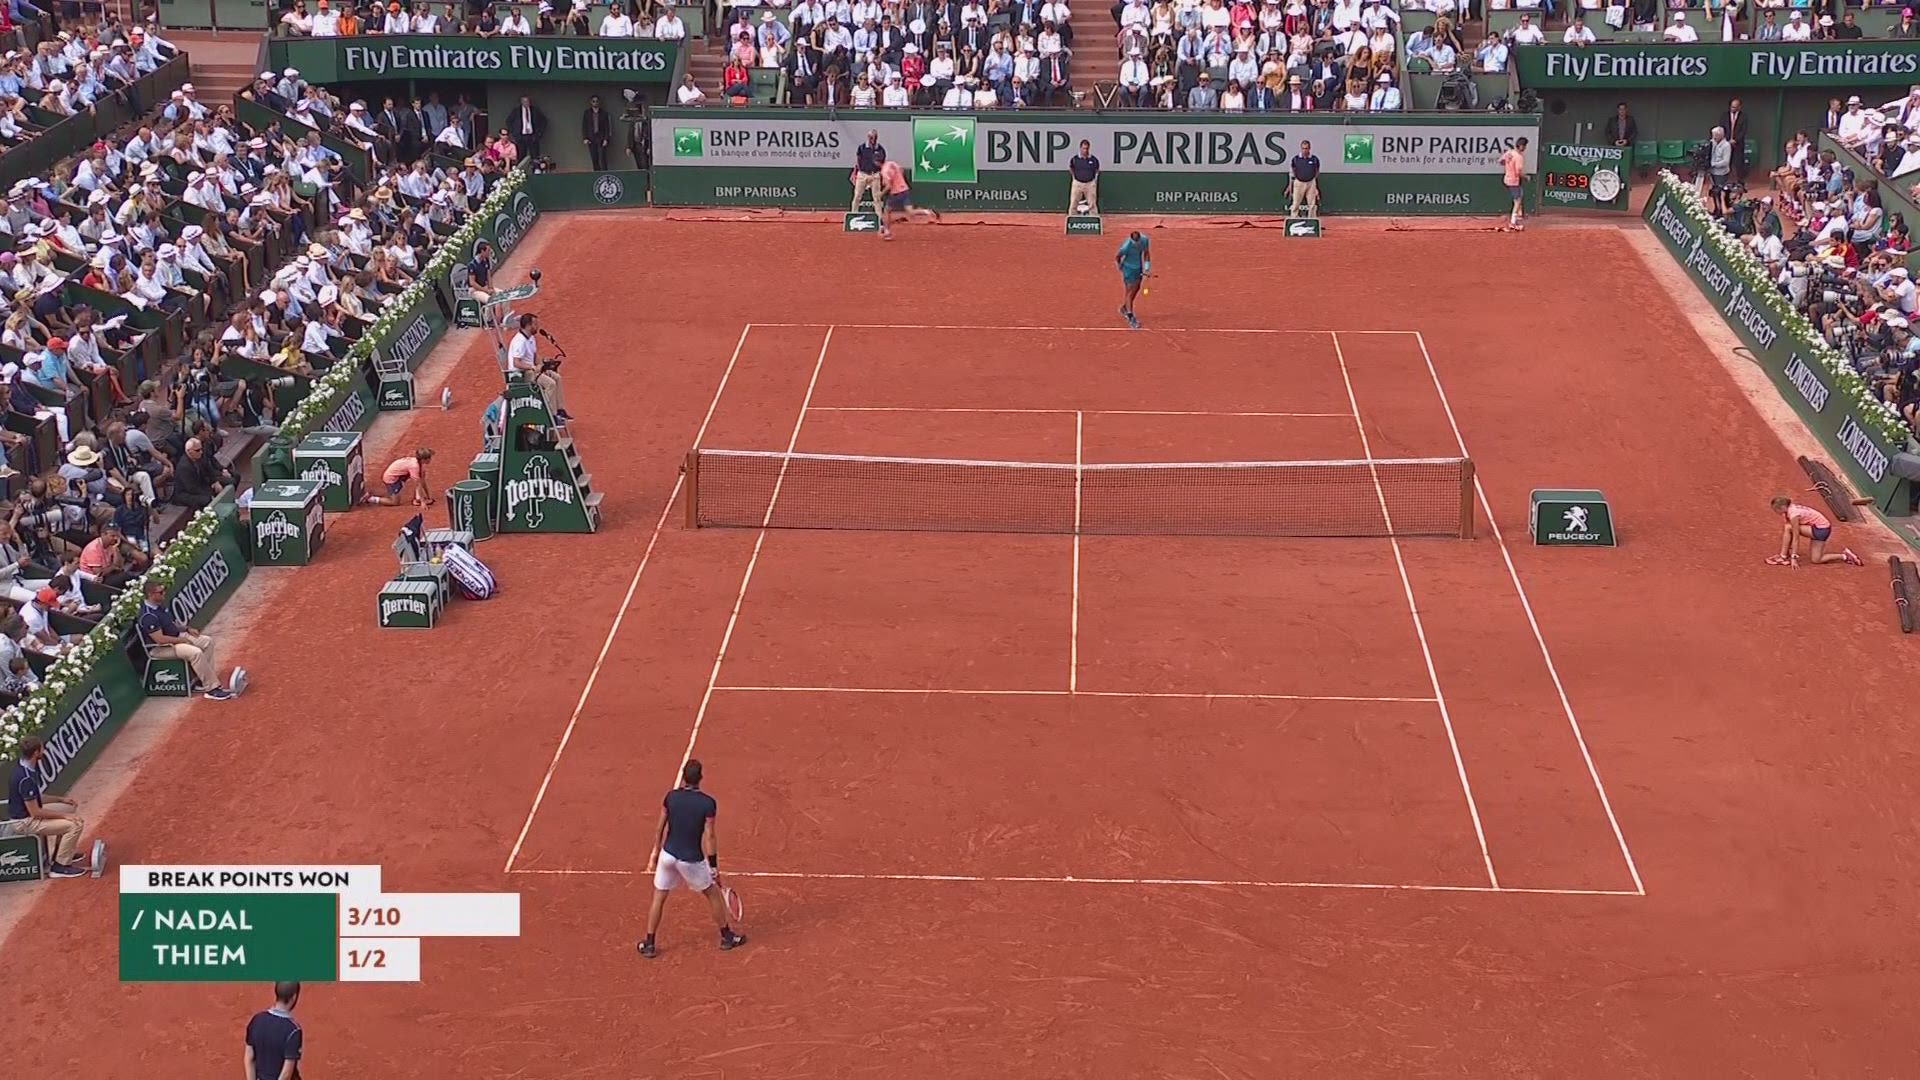 Roland Garros Handdoek.Anticlimax Serena Williams Haakt Geblesseerd Af Op Roland Garros